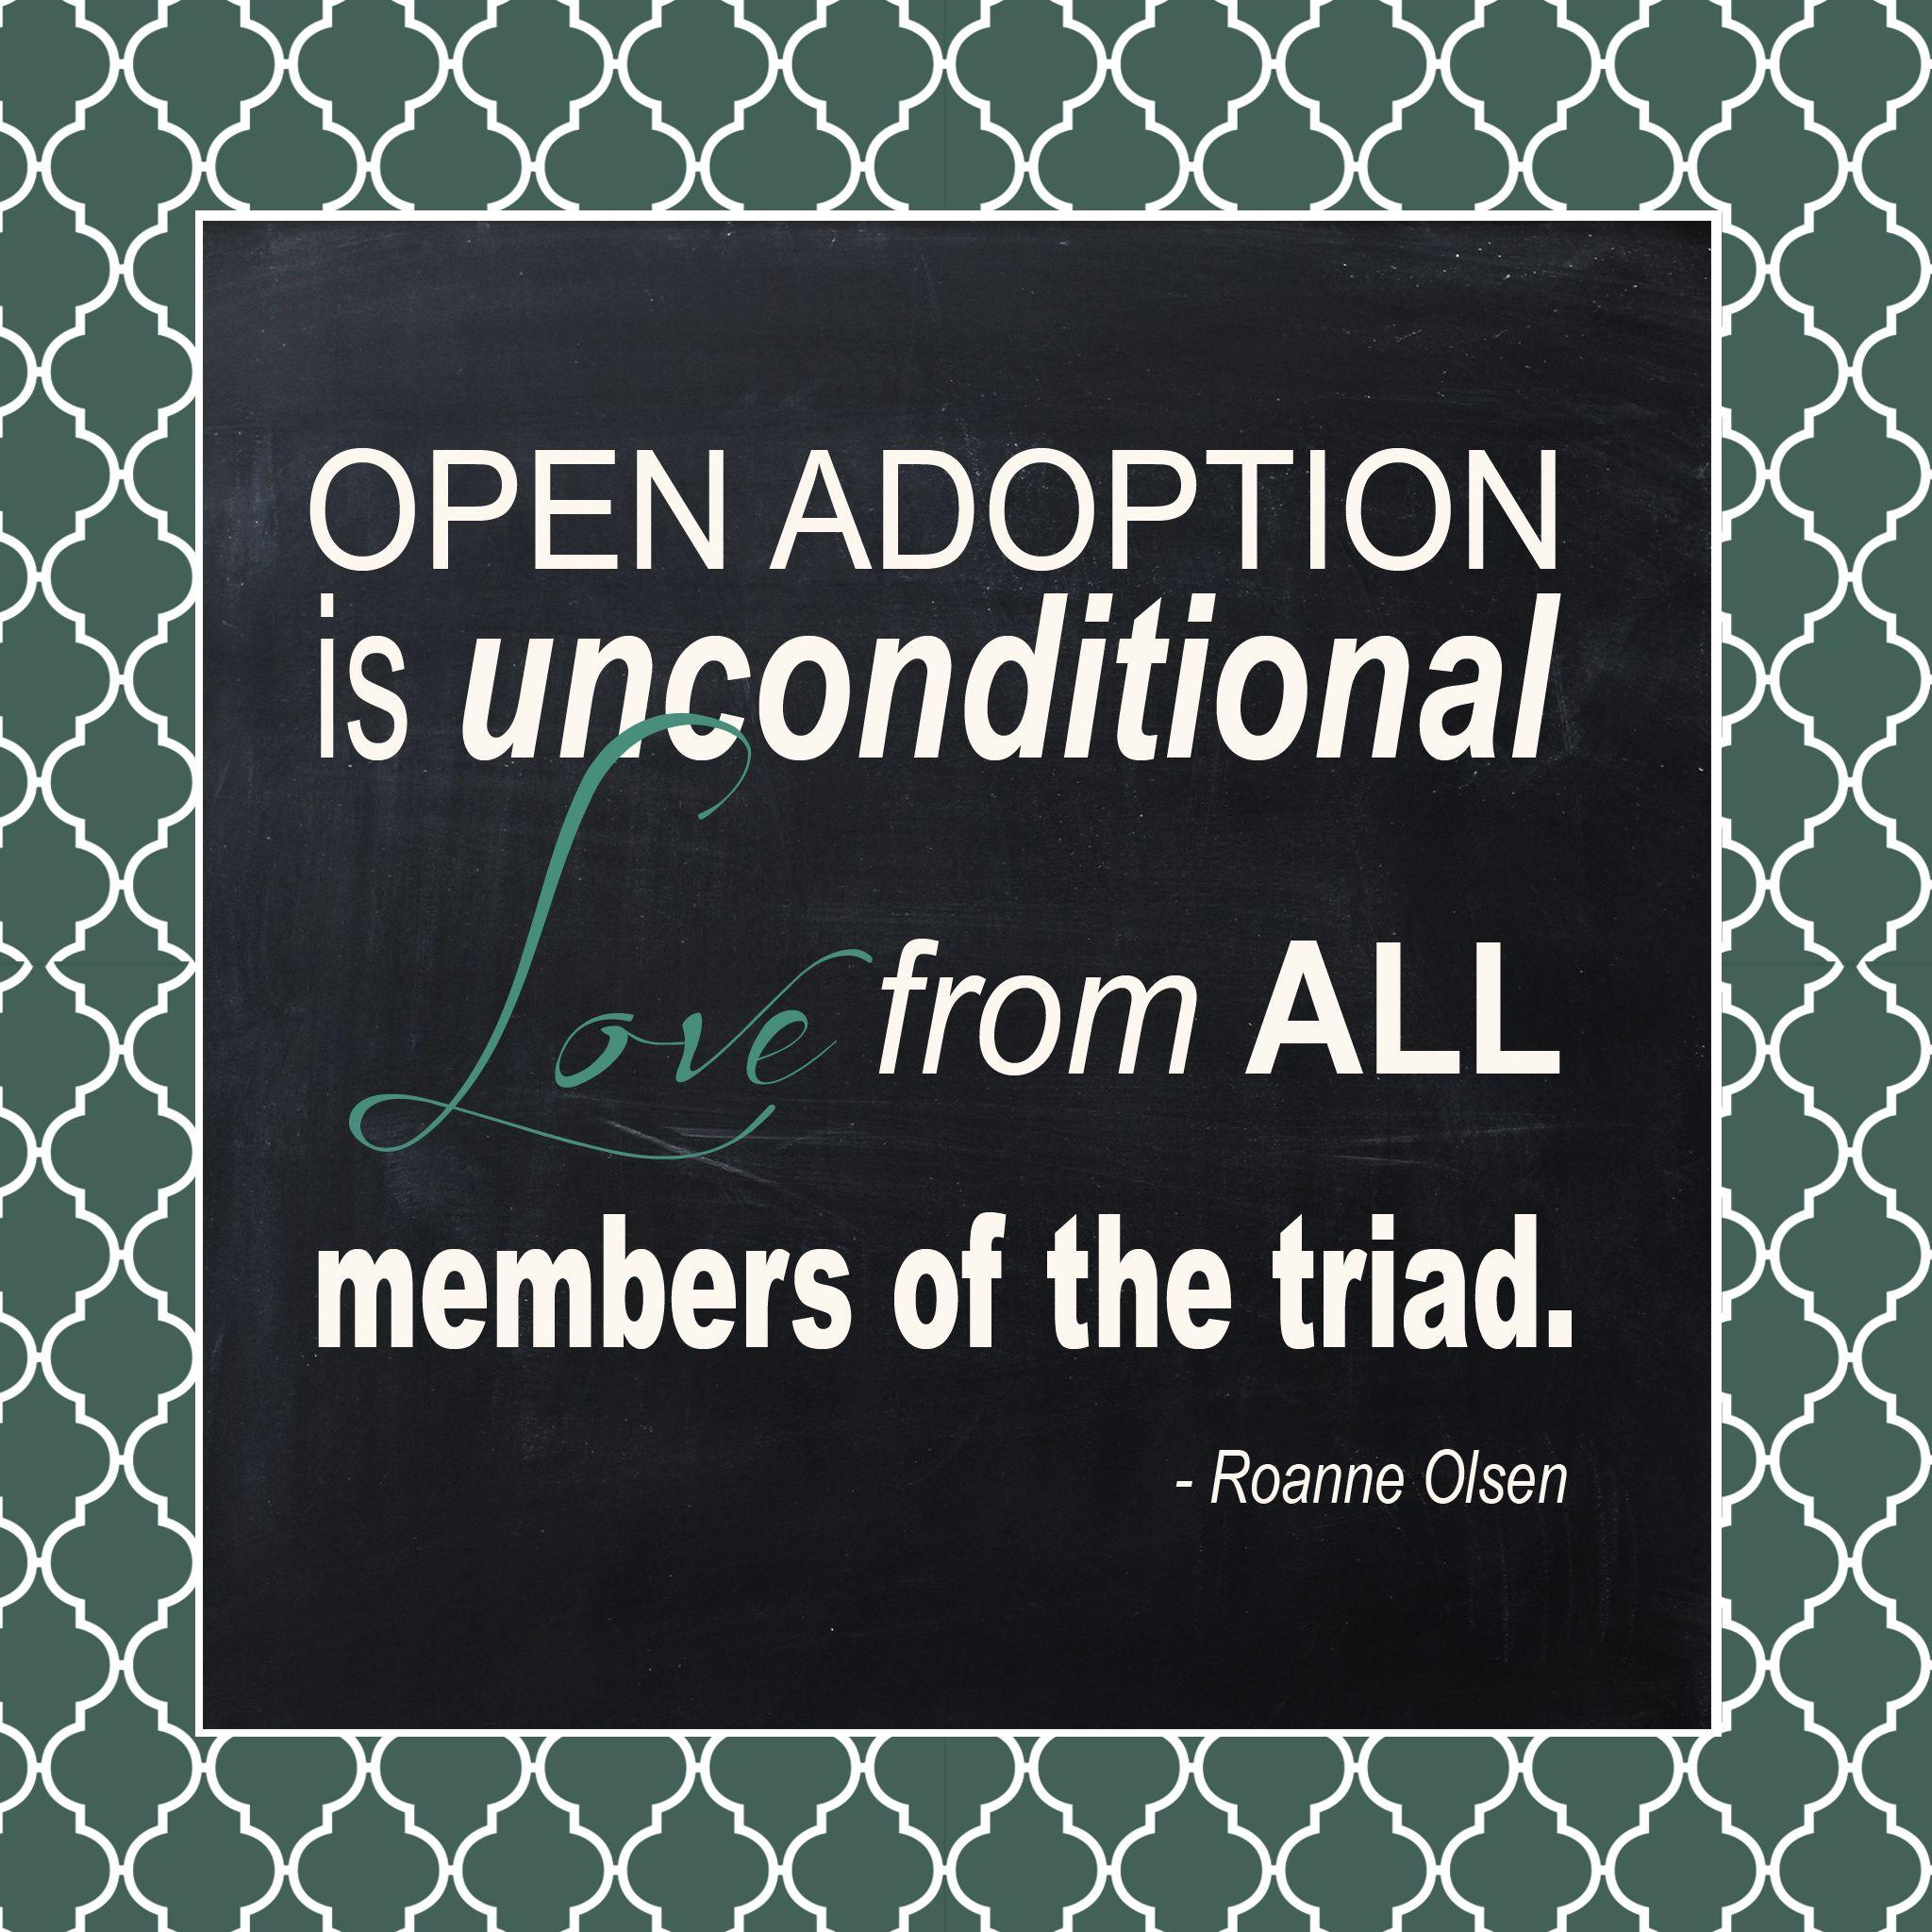 Quotes About Adoption Adoption Quote#adoption #openadoption #adoptionquotes .